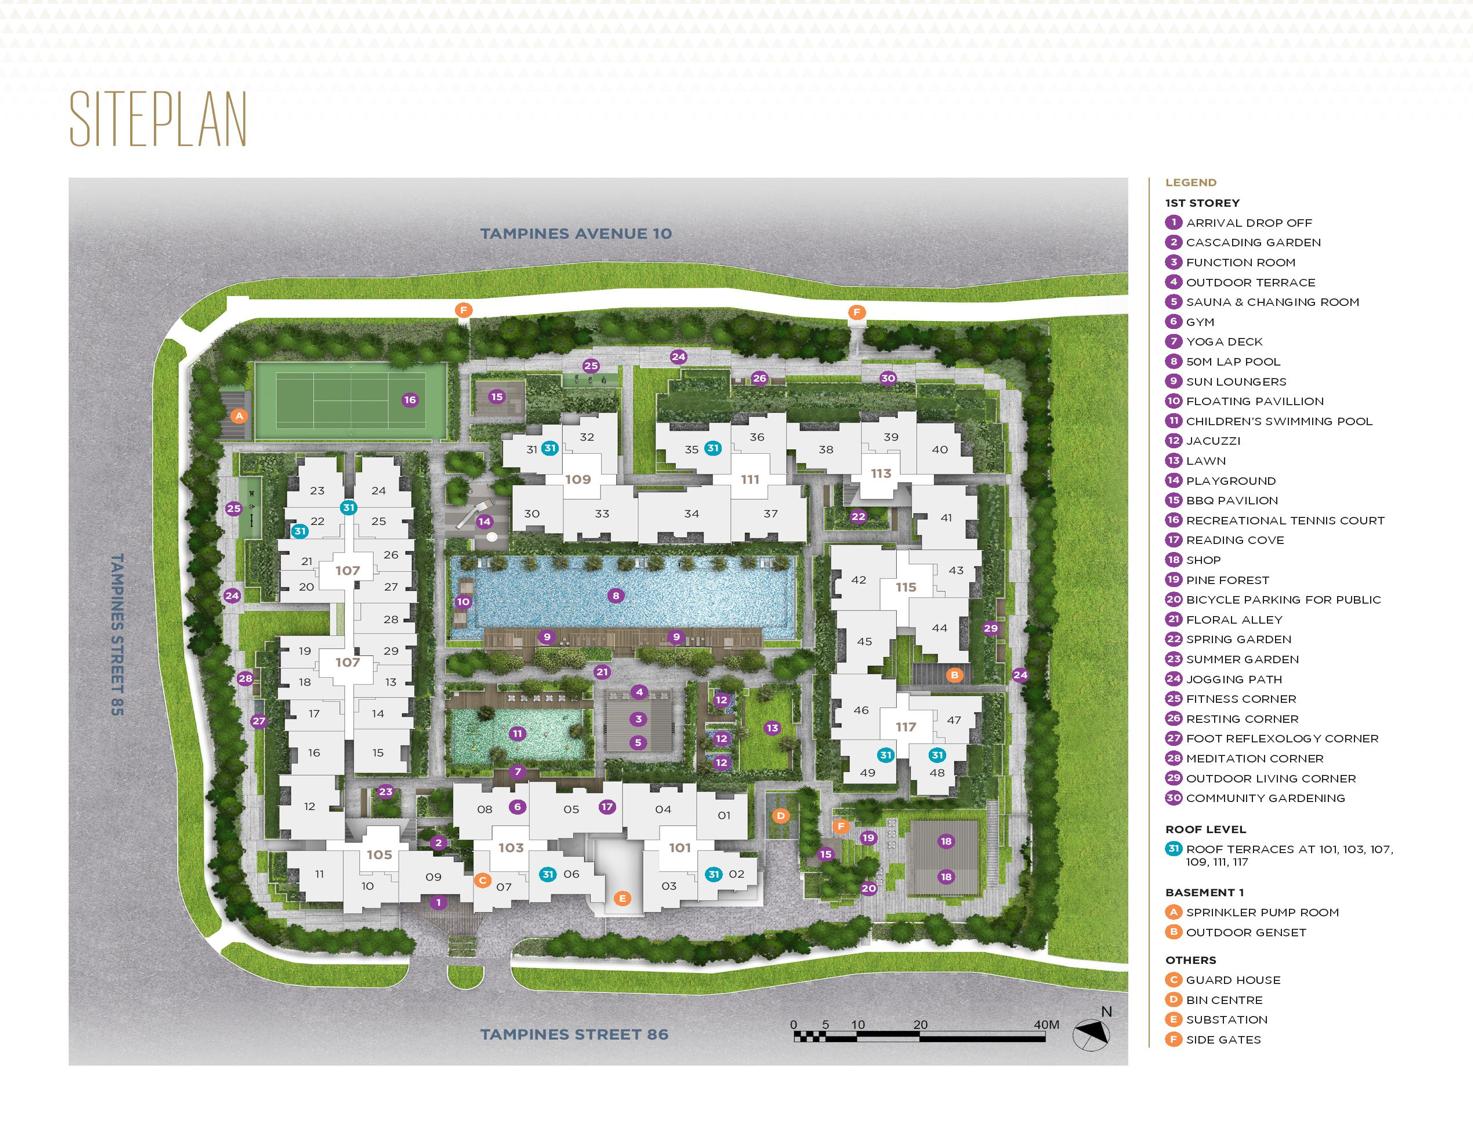 alps-site-plan